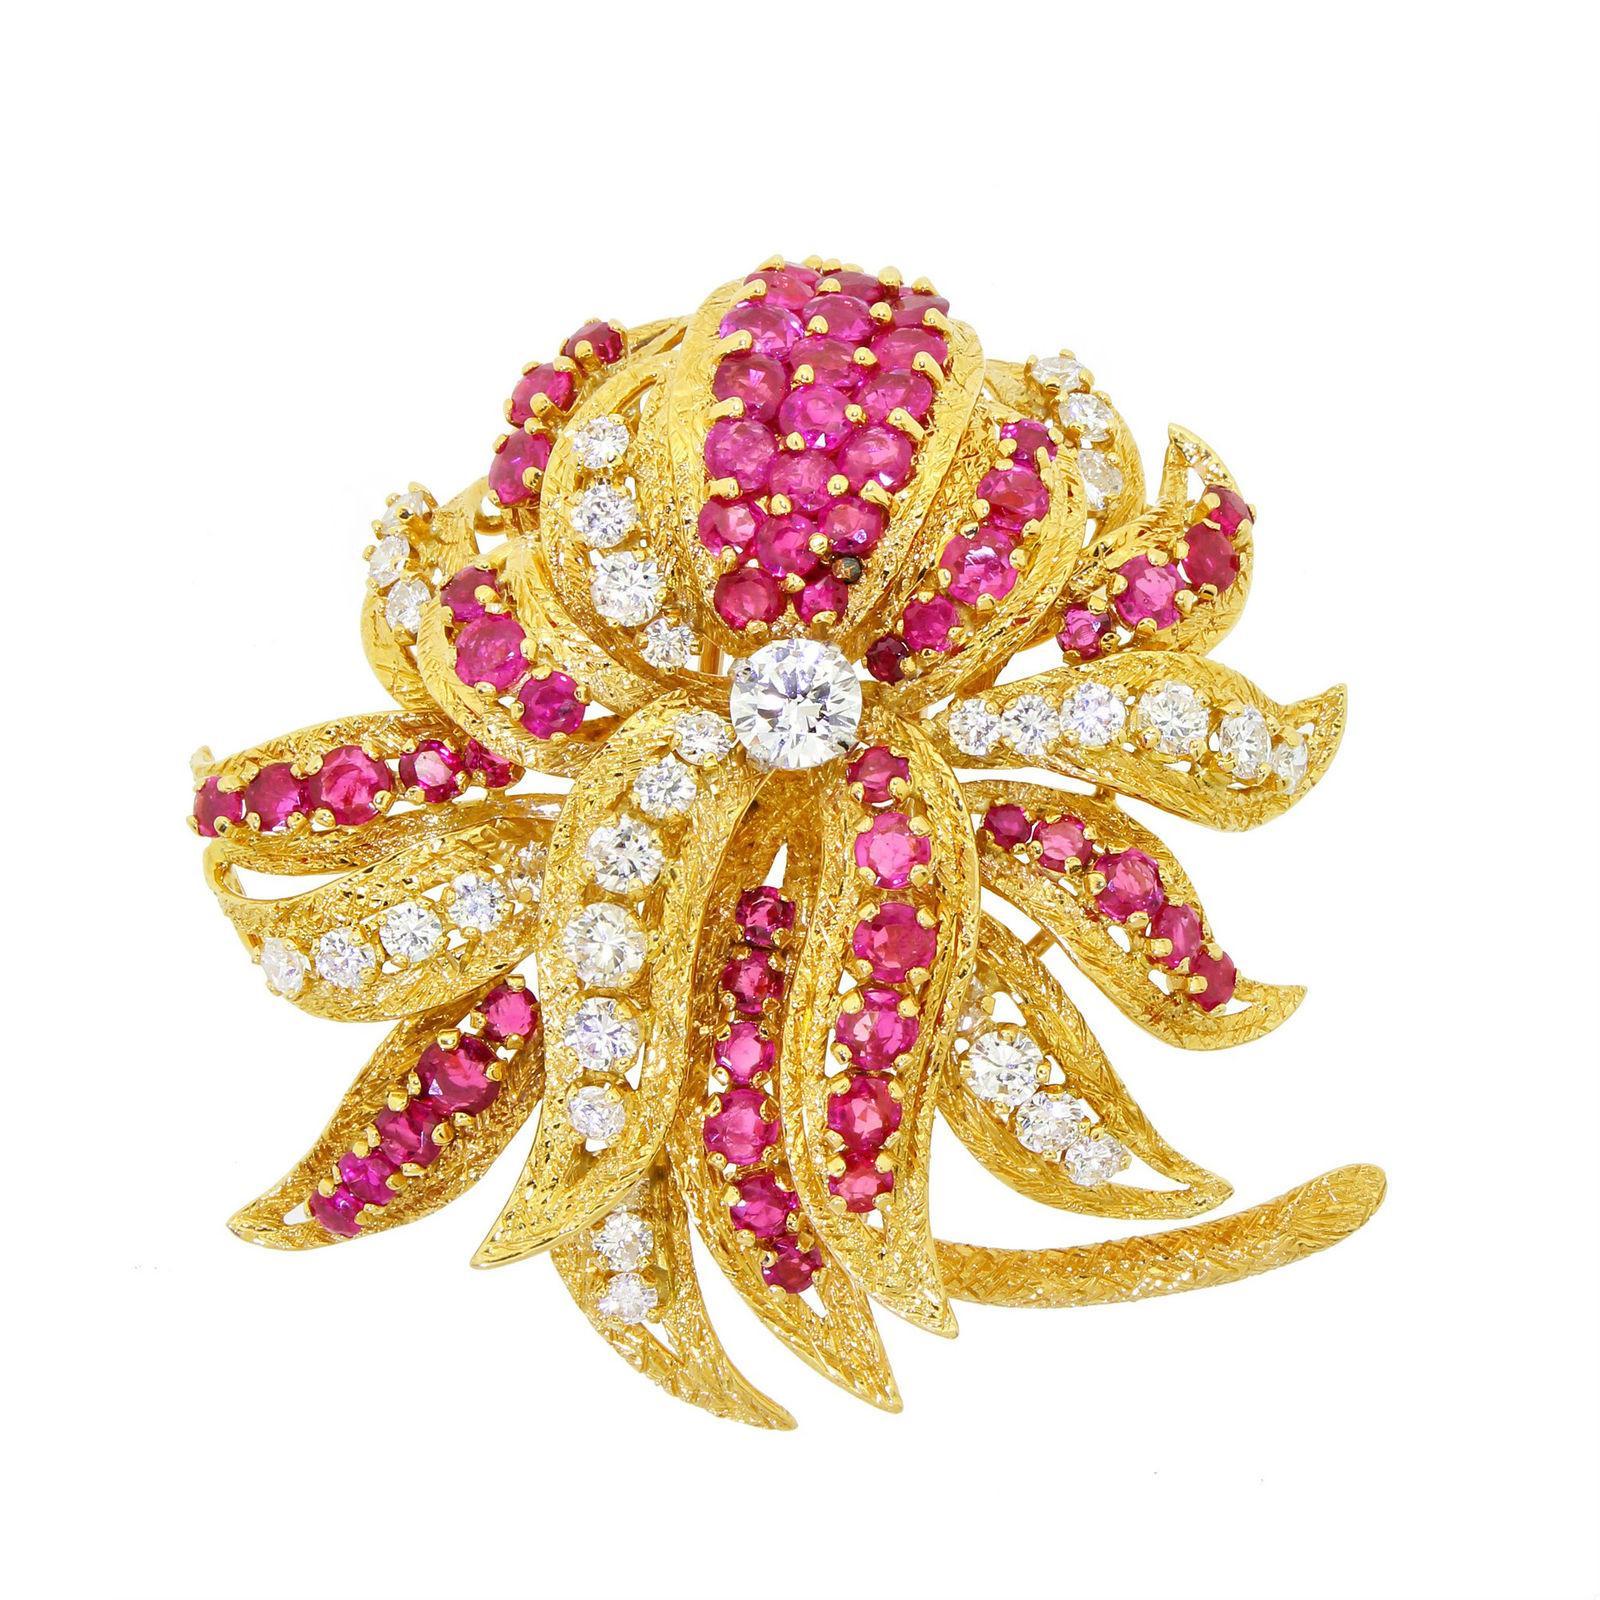 Kutchinsky Of London 18k Gold Diamond Ruby Floral Cluster Brooch 10.60 Carat